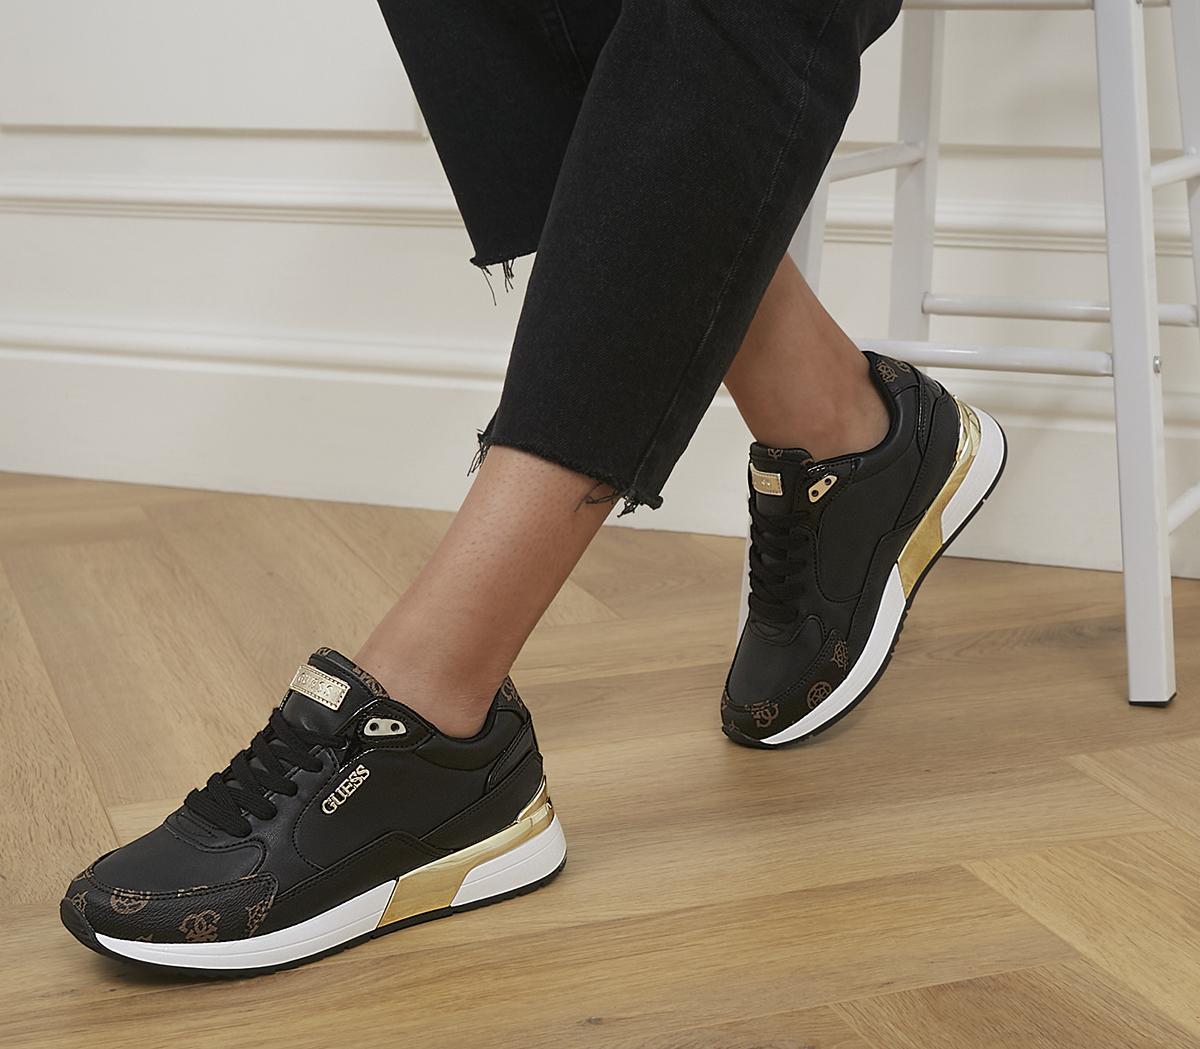 Moxea Sneakers